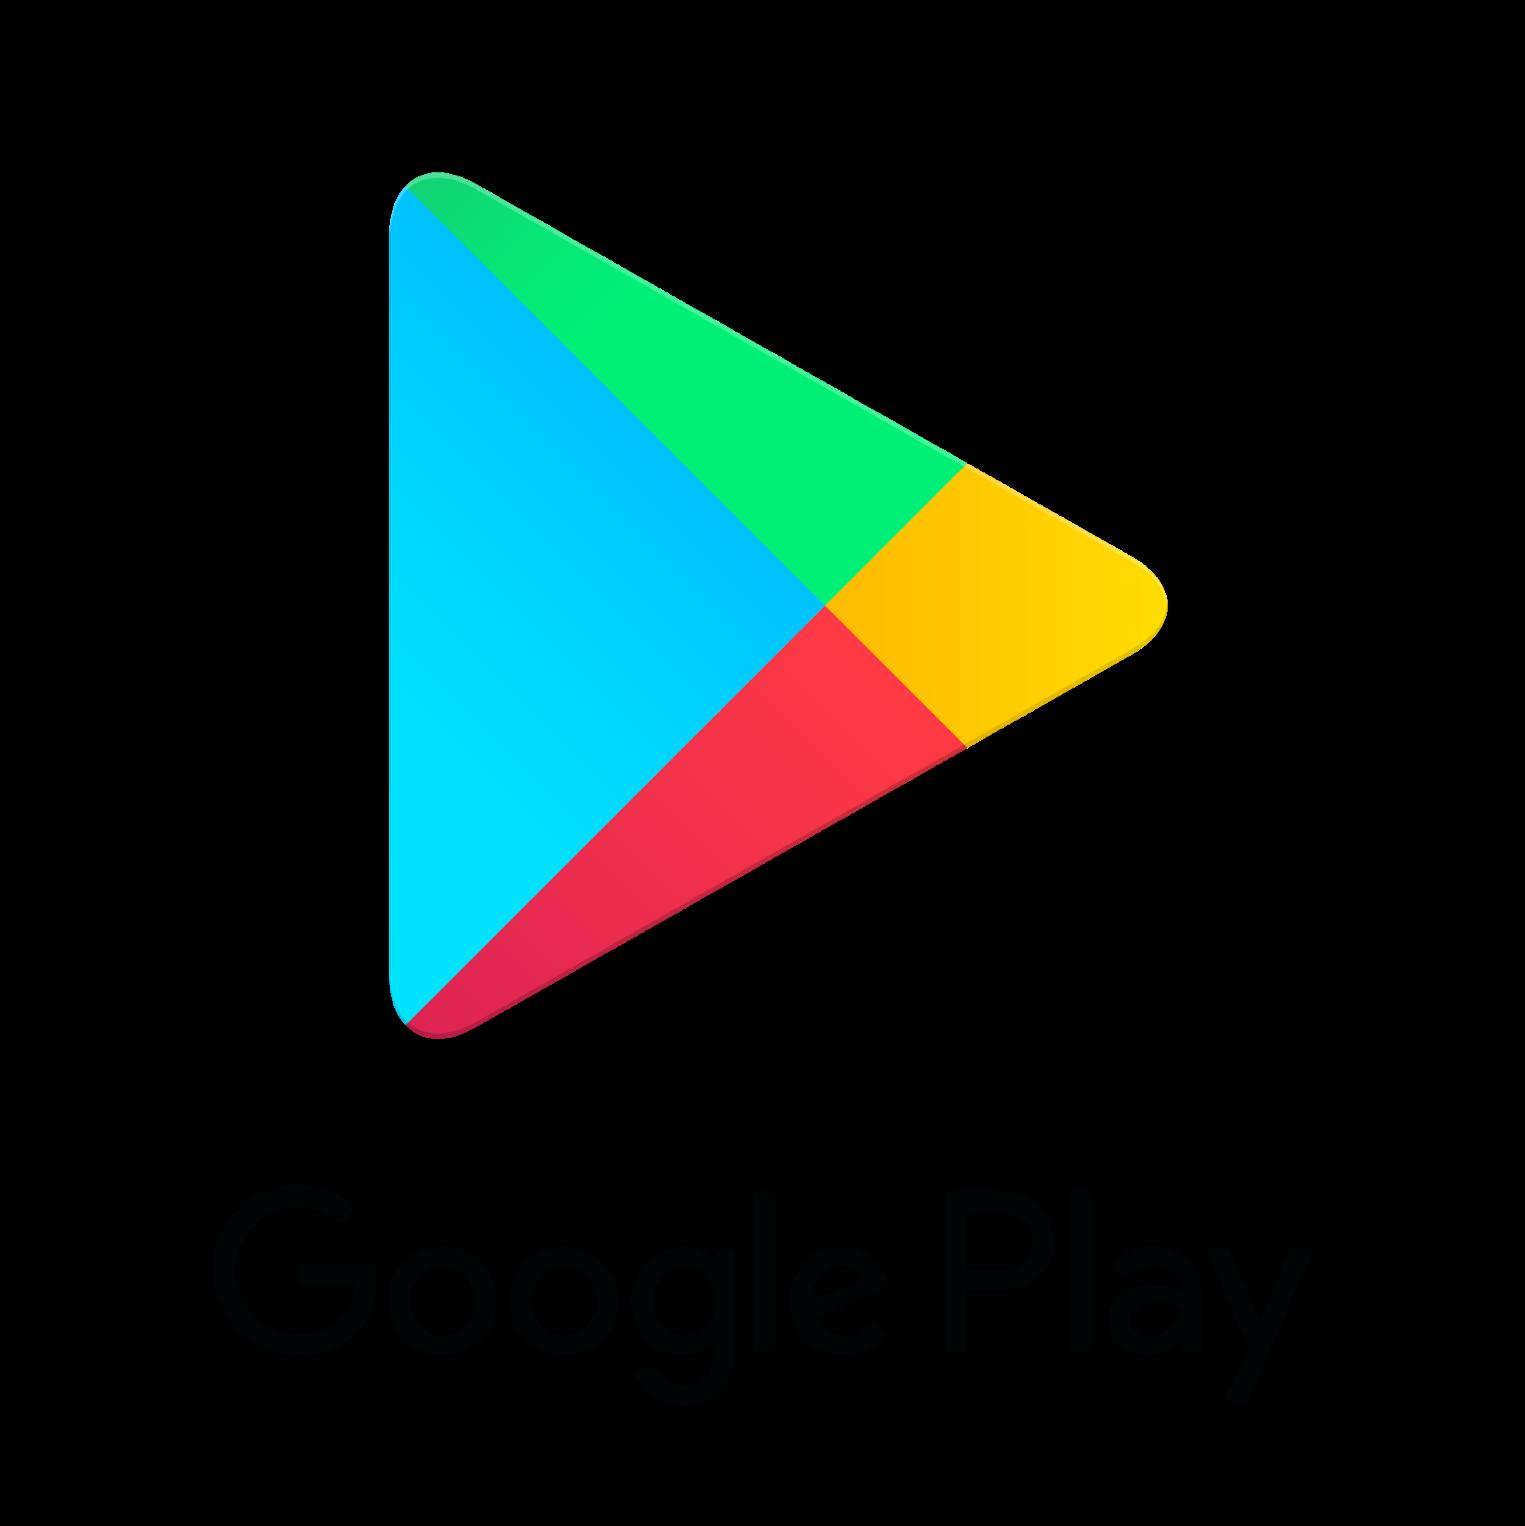 Google Play Logo Png & Free Google Play Logo.png Transparent.